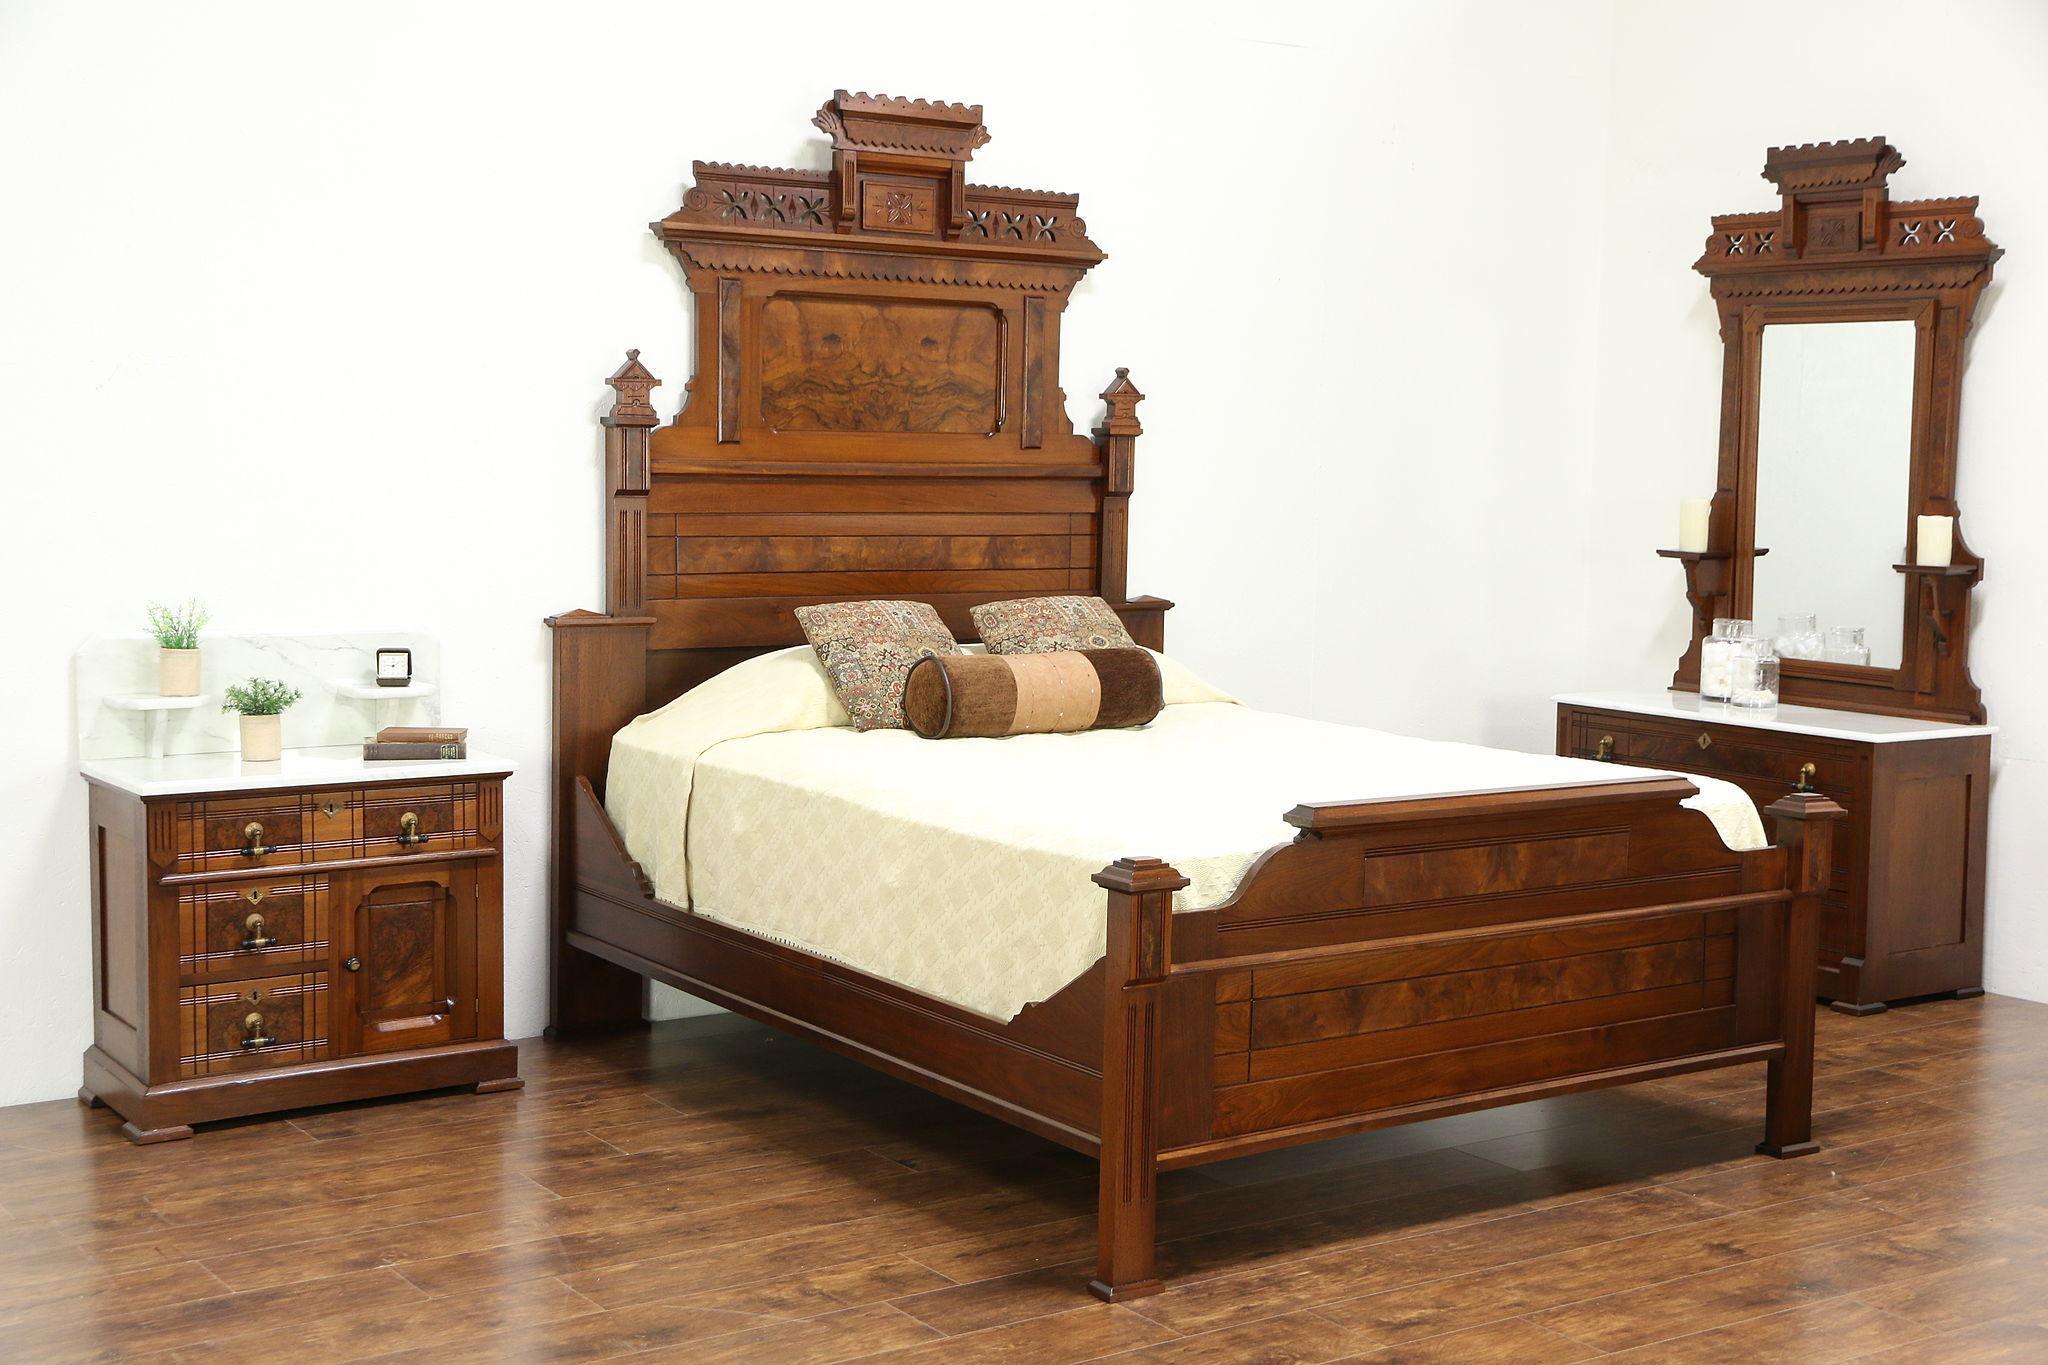 Sold Victorian Eastlake Antique 1875 Walnut Queen Size 3